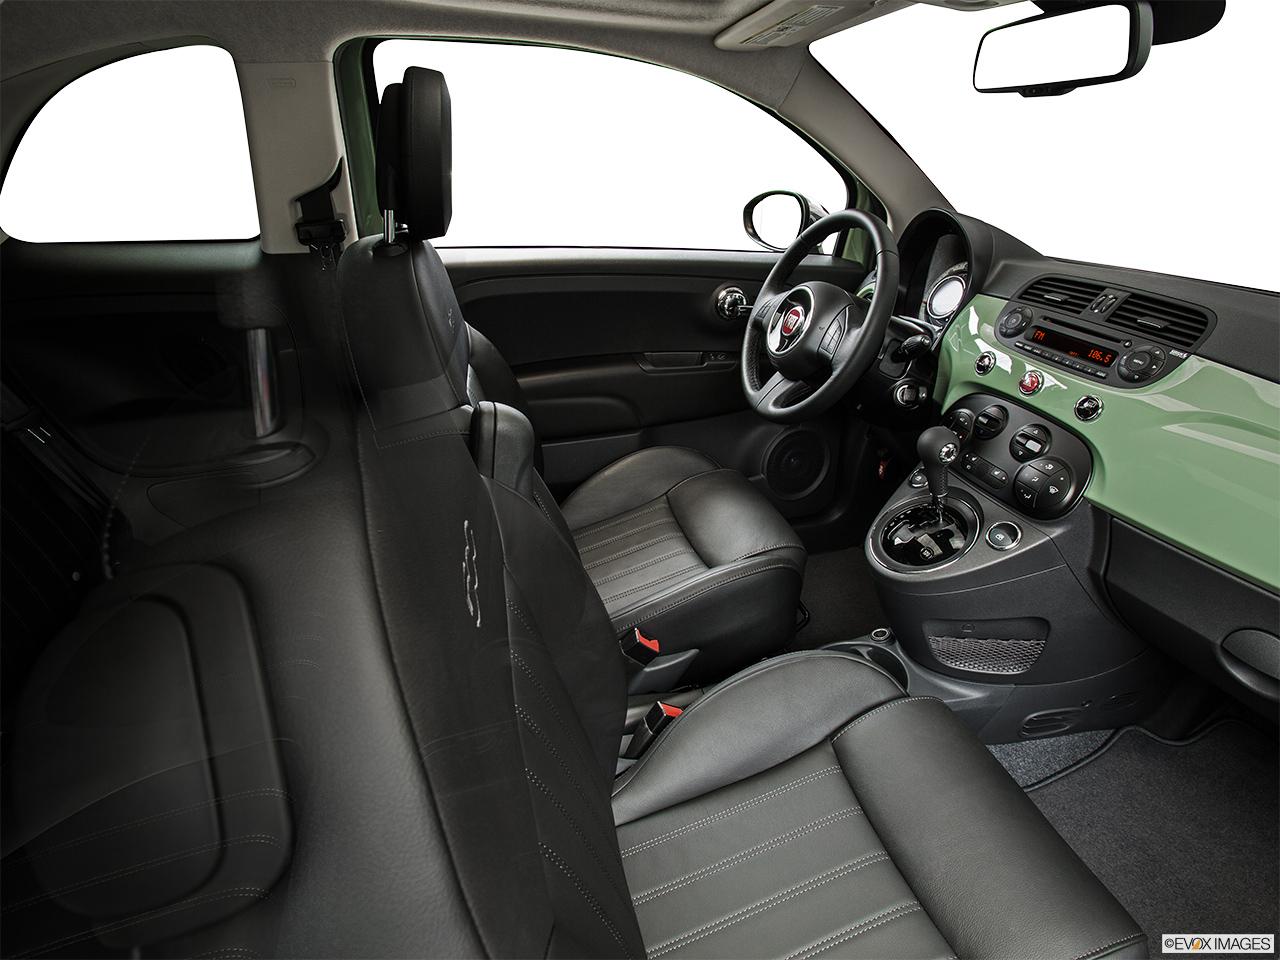 2014 fiat interior. 2014 fiat 500 2 door 1957 edition hatchback fake buck shot interior from passenger fiat 0